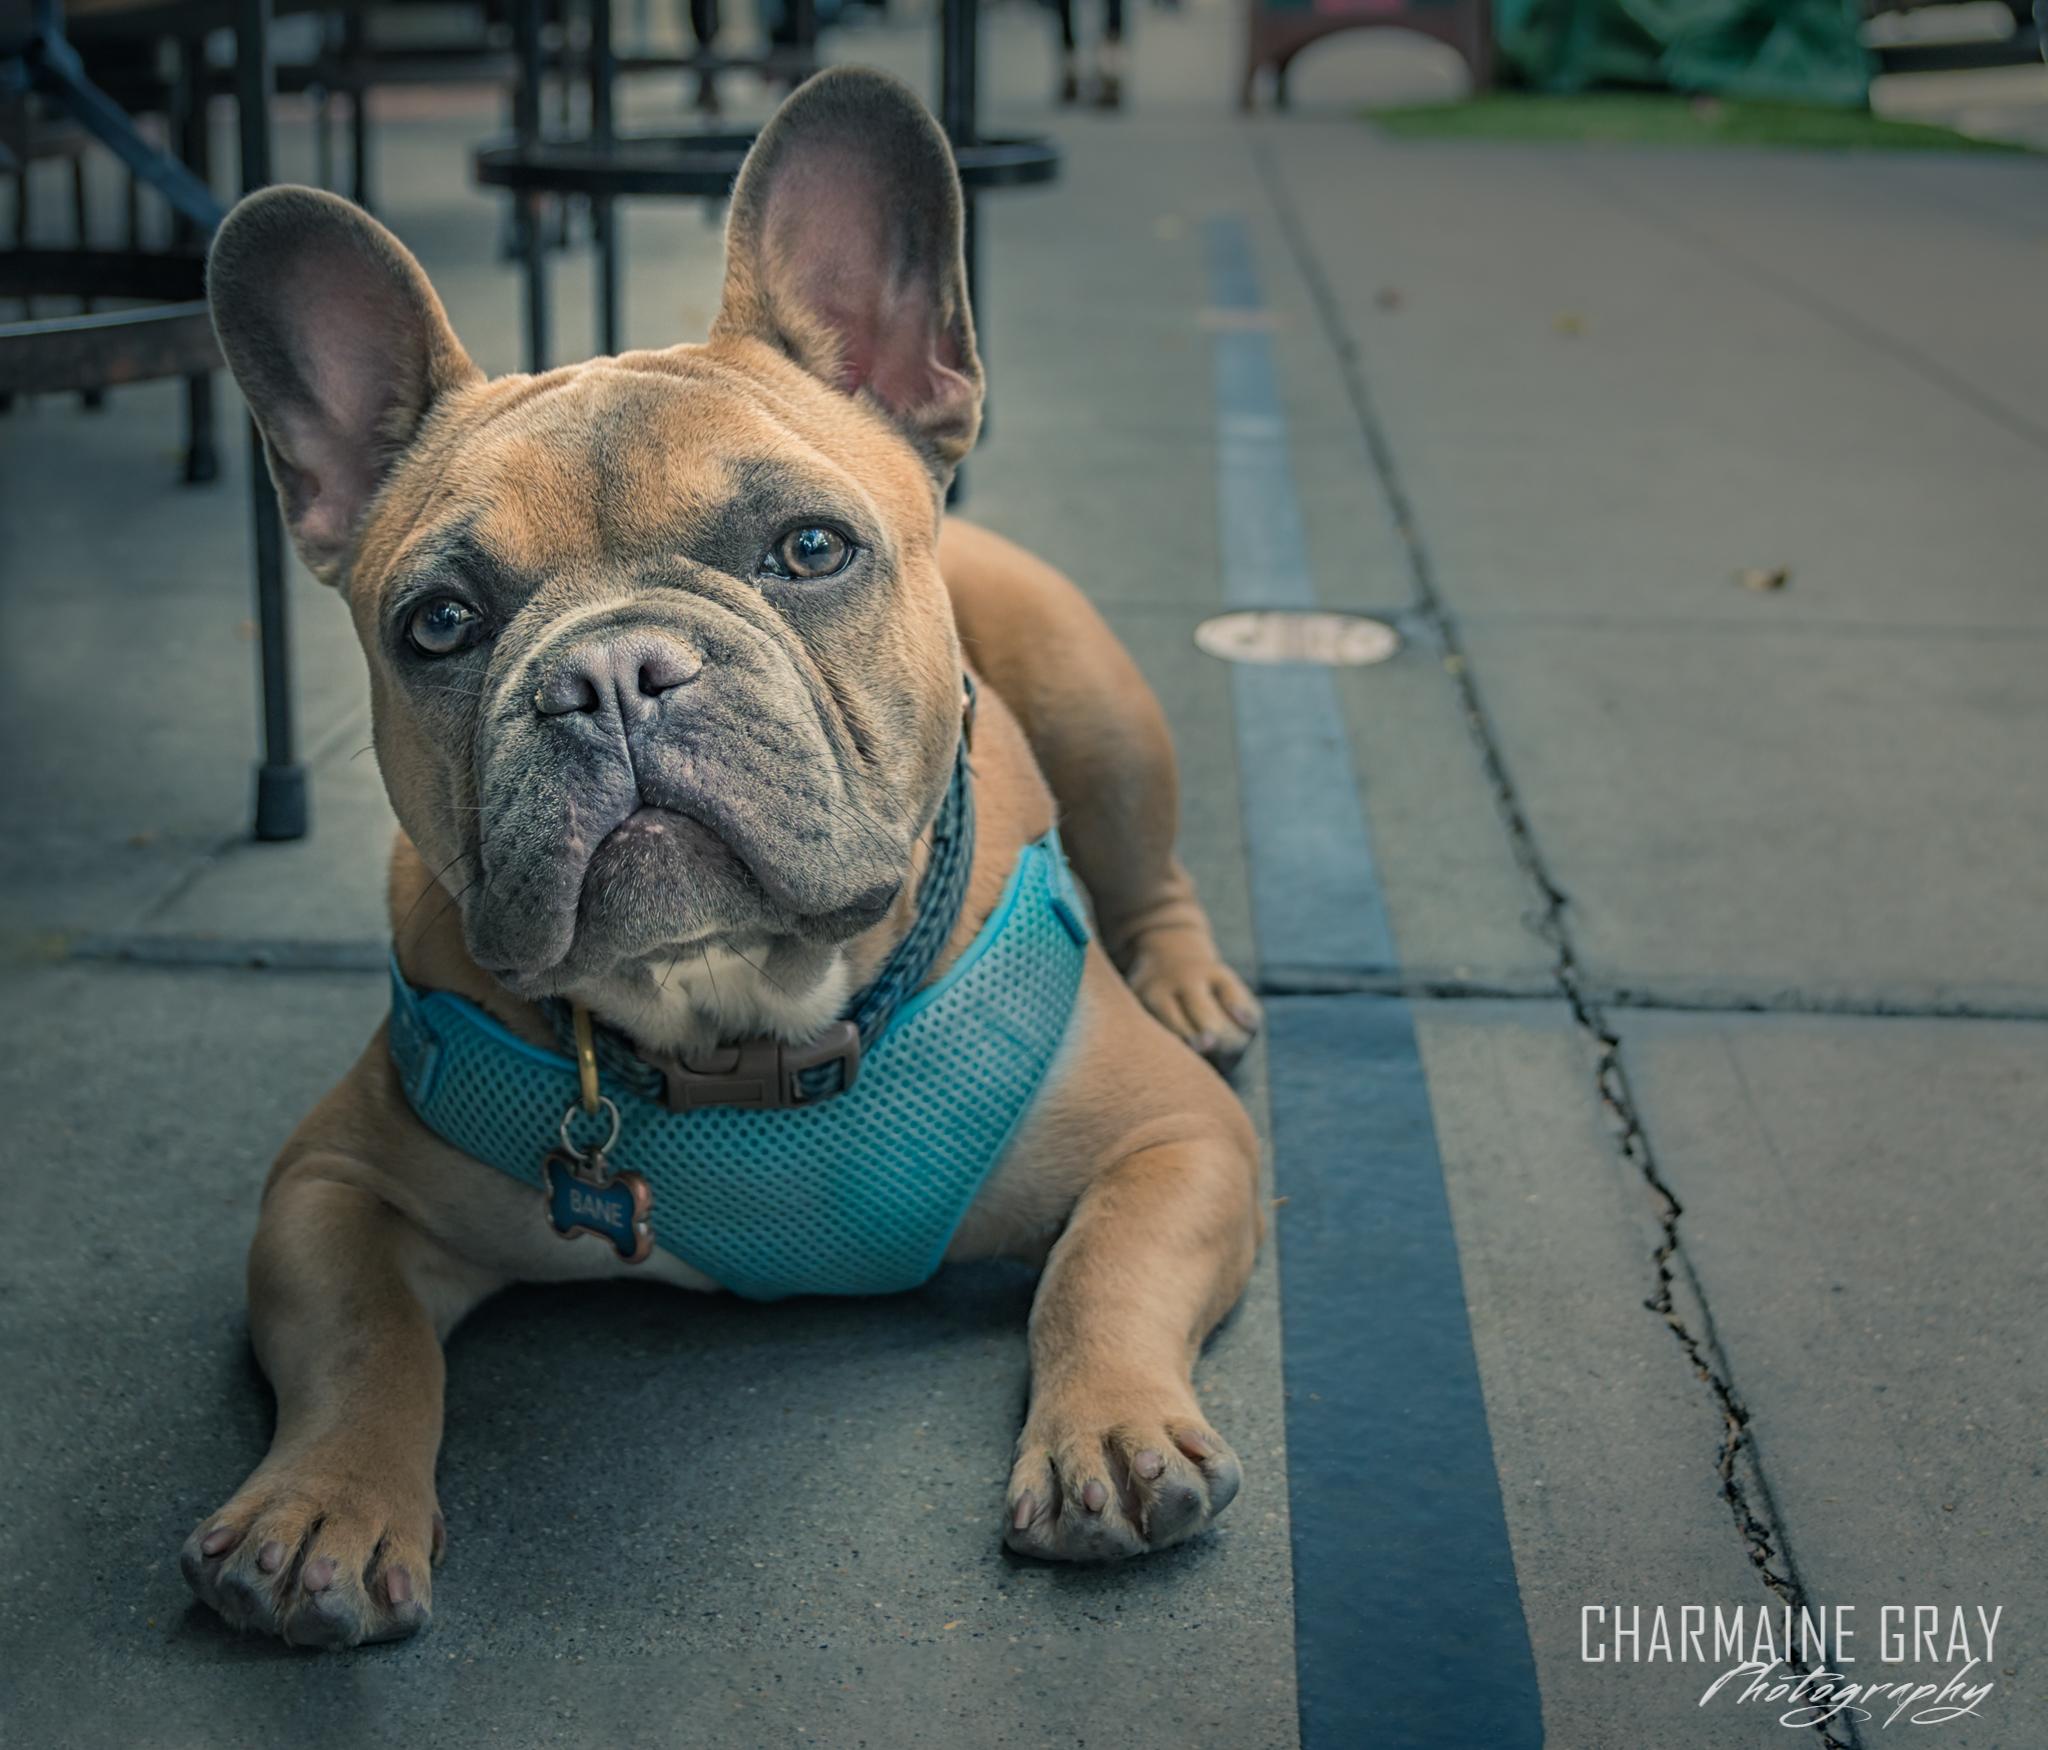 pet photographer, pet photography, pet portrait, pet, animal, charmaine gray photography, charmaine gray pet photography, san diego,dog, french bulldog, frenchie